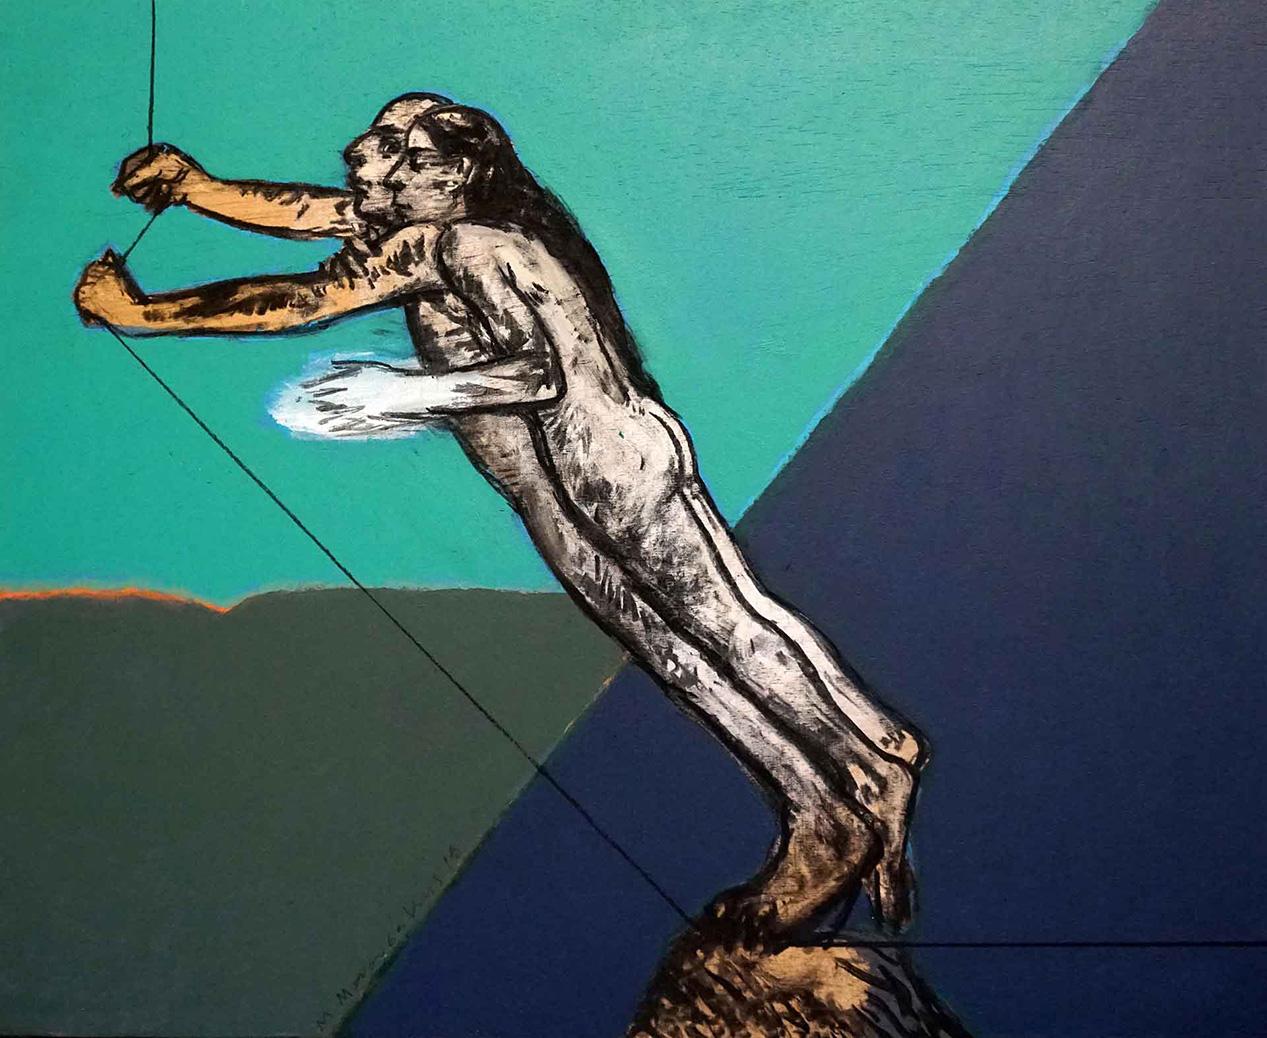 Michalis Manousakis, Untitled, 2018, acrylics on wood, 45 x 55 cm